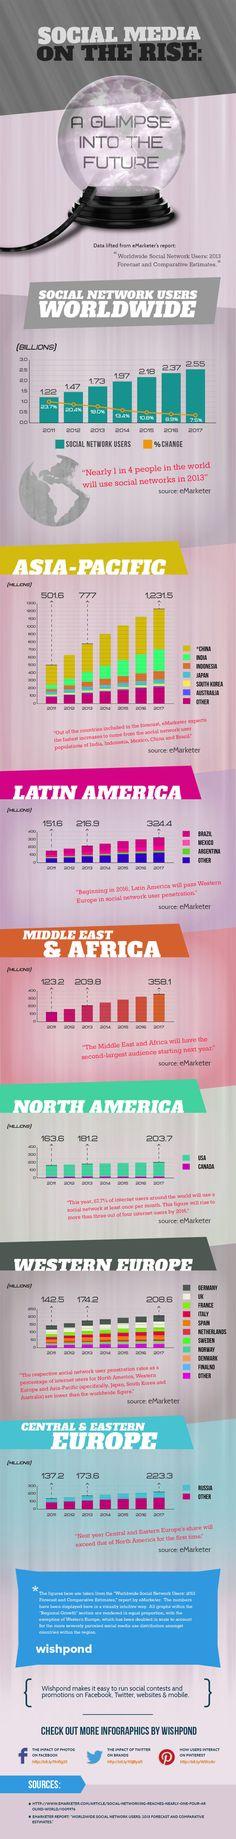 Social Media on the Rise: A Glimpse into the Future - #SocialMedia #Infographic